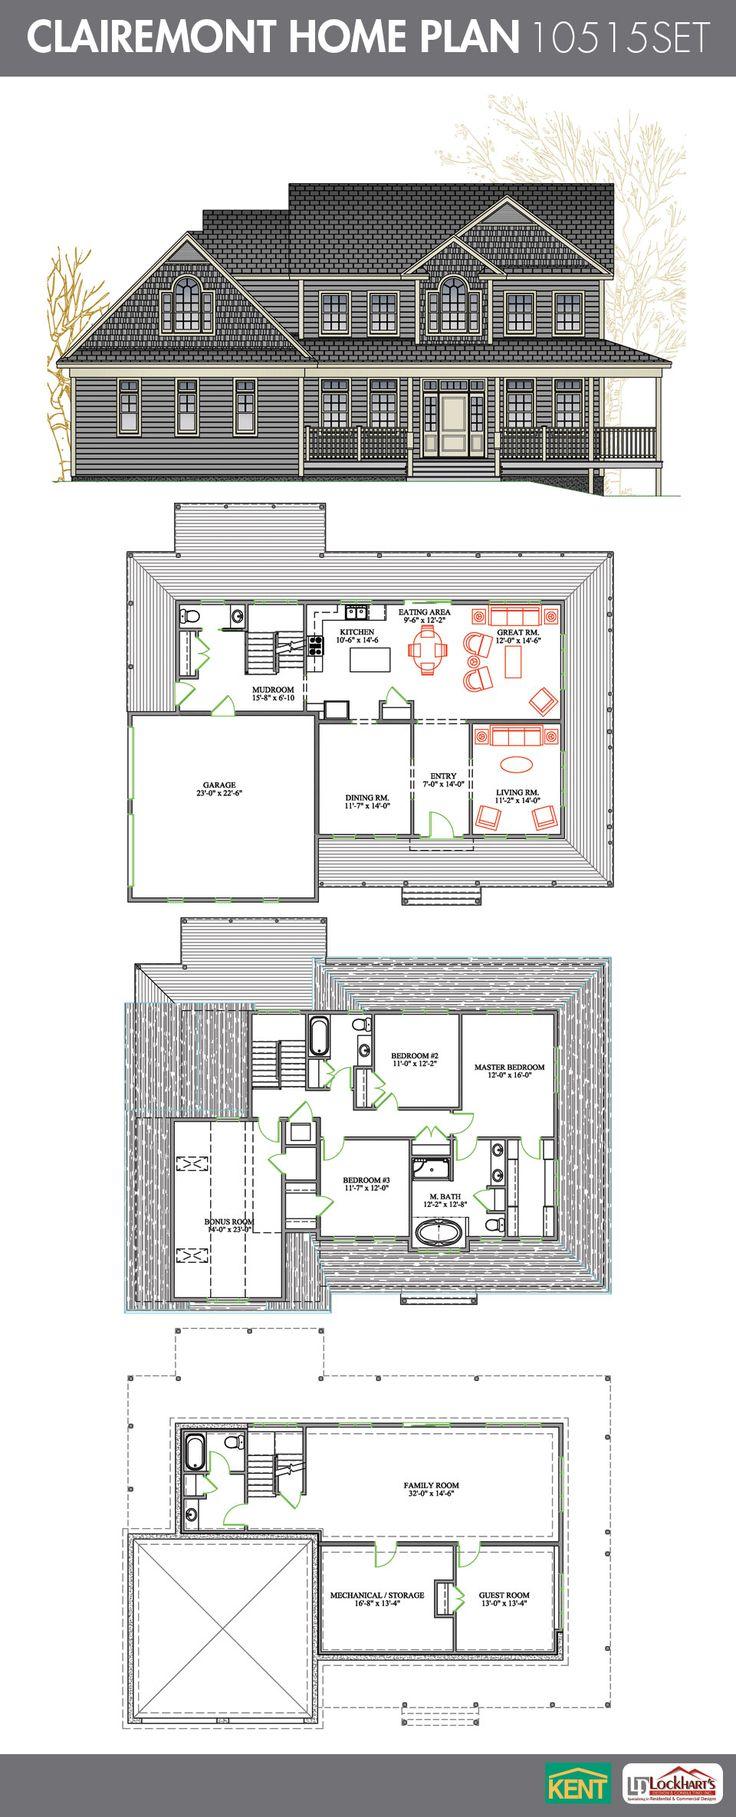 Clairmont 4 bedroom 3 12 bath home plan